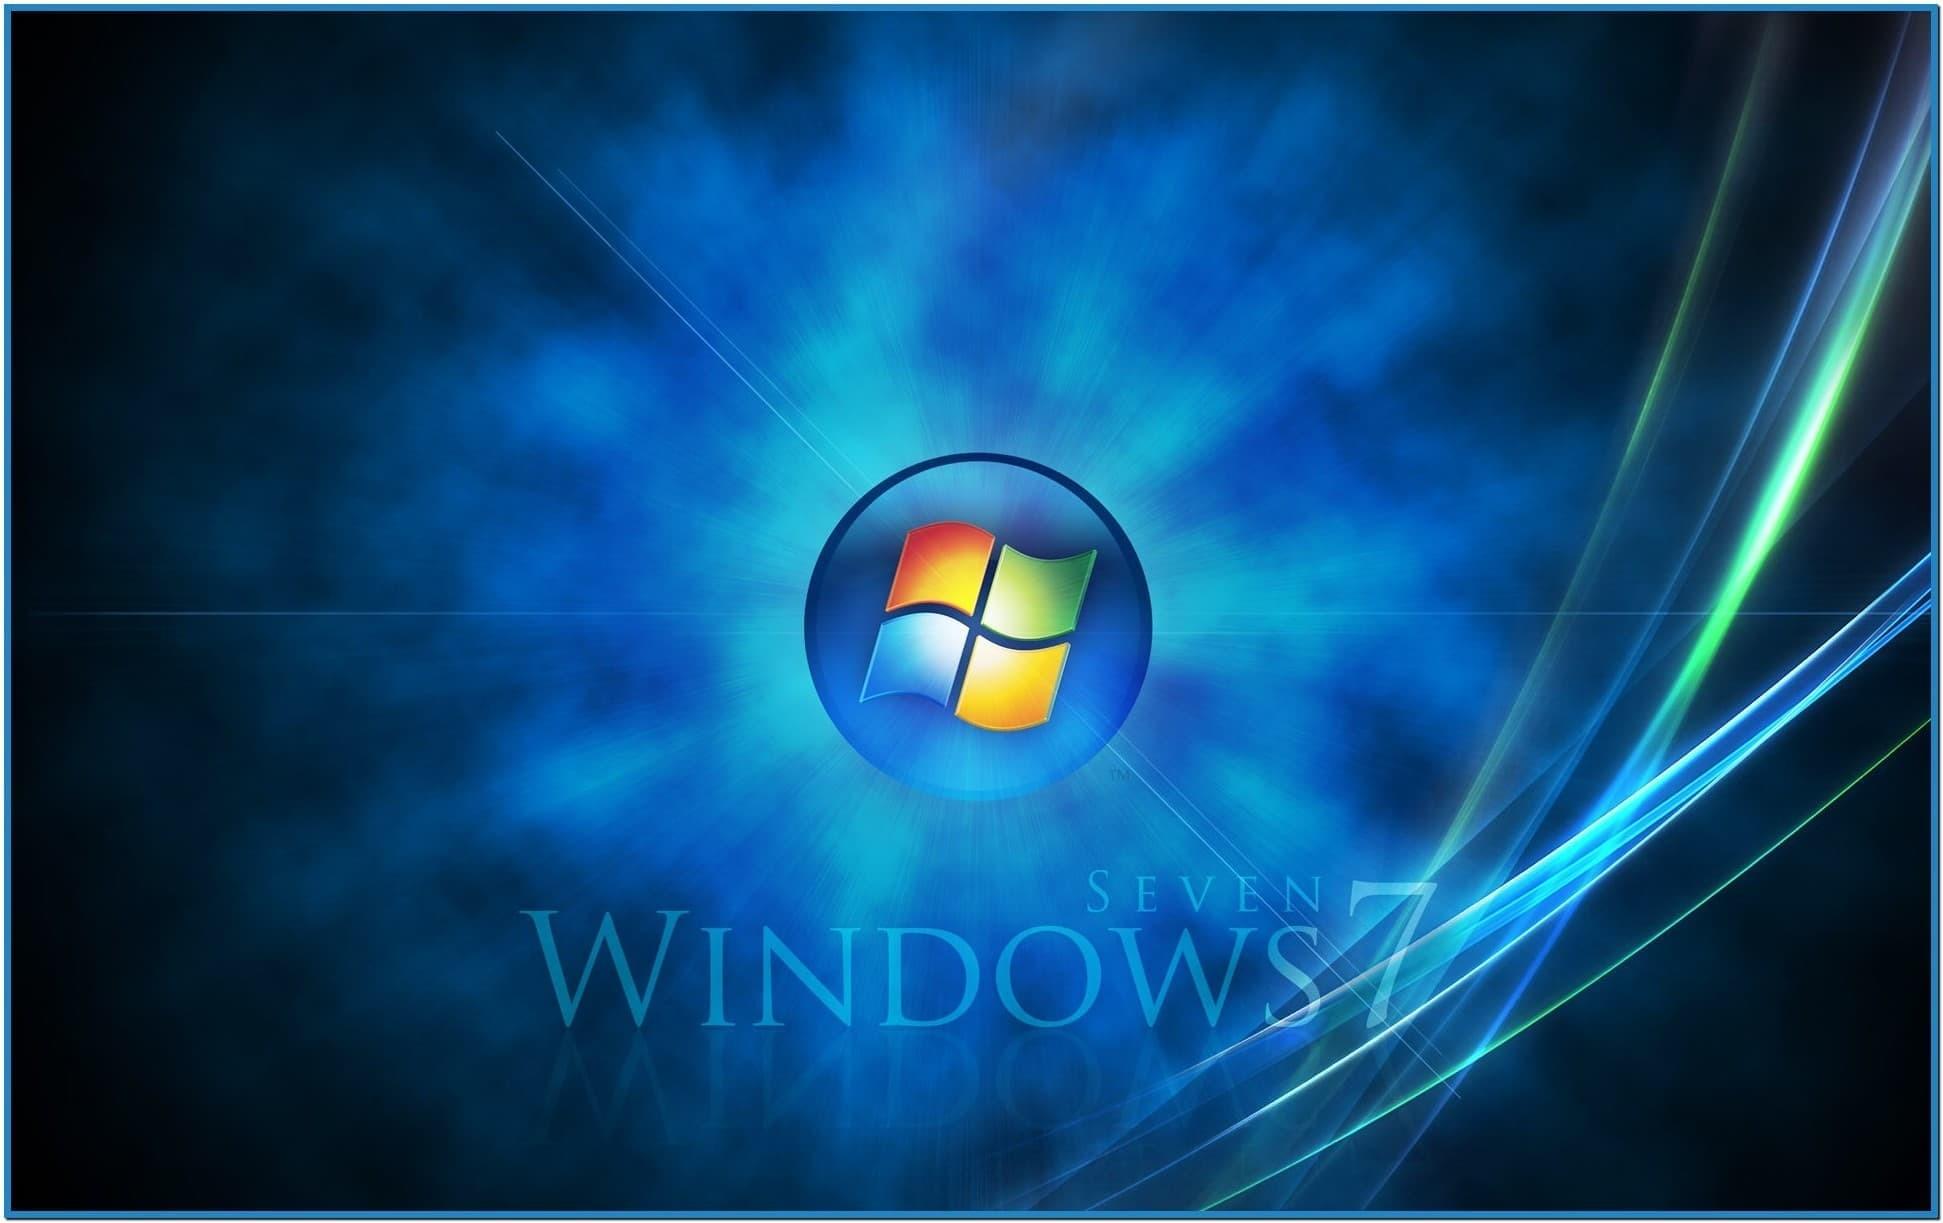 Microsoft Free Screensavers And Wallpaper